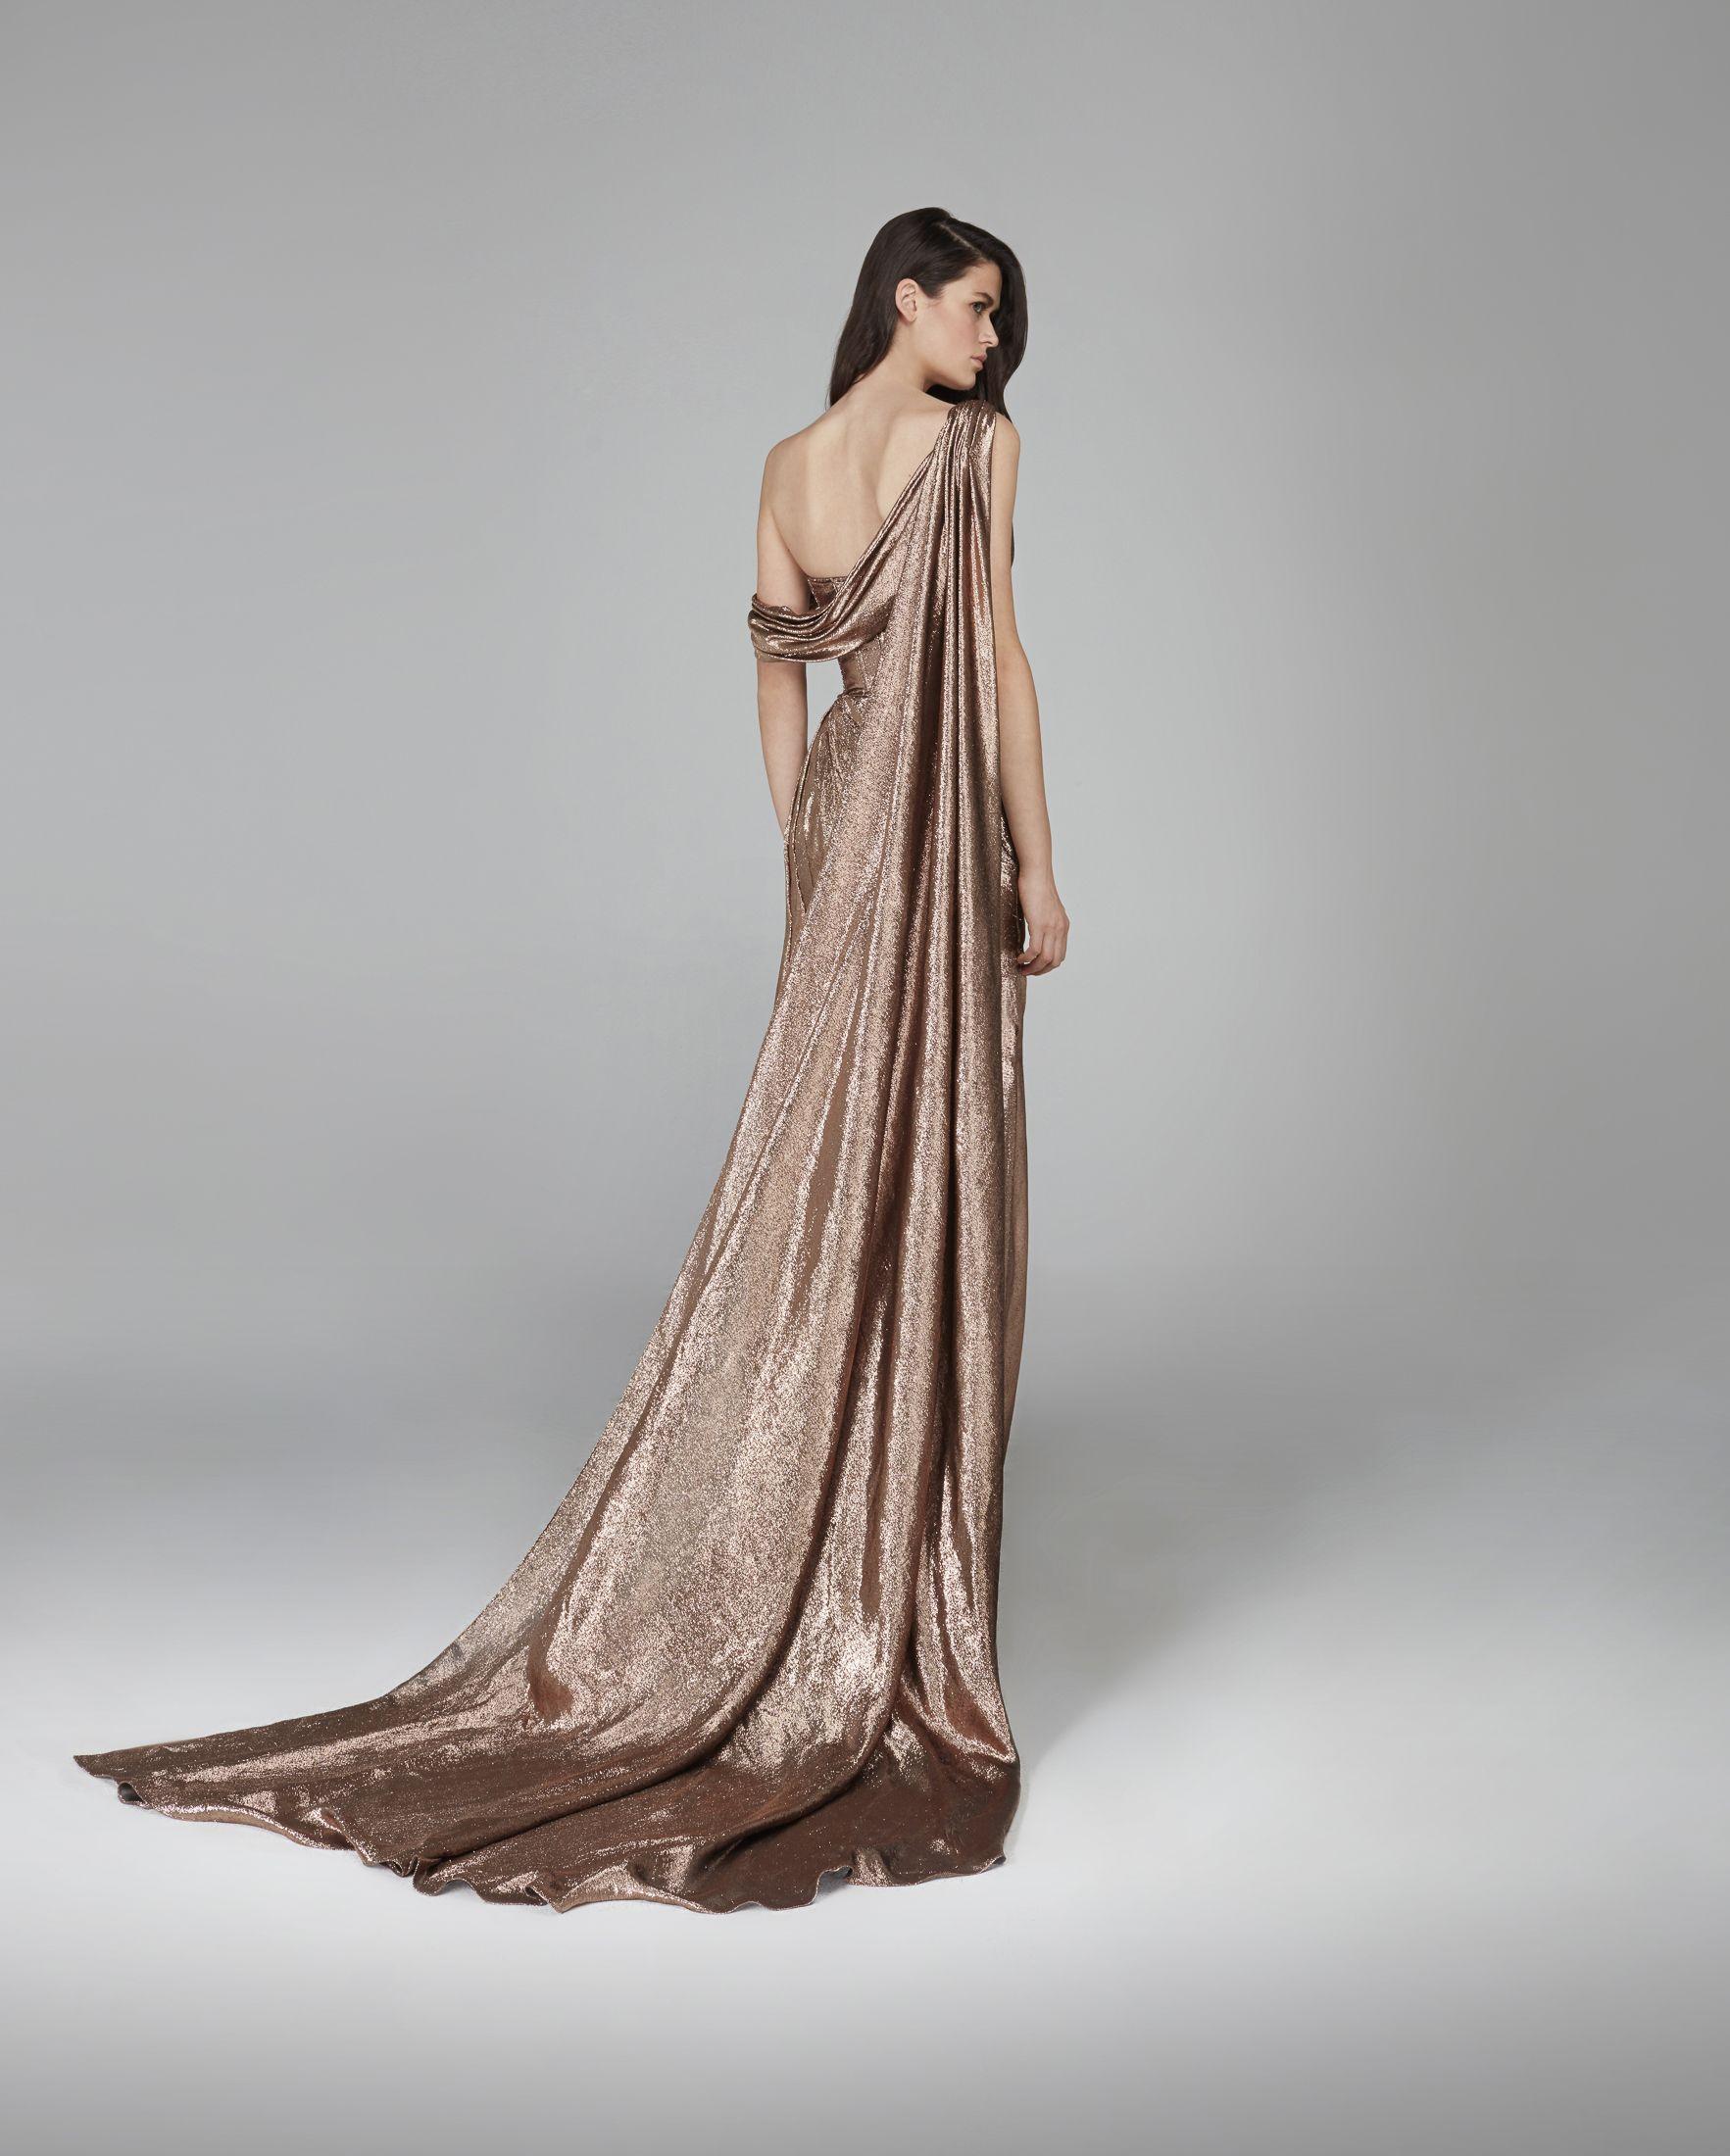 Dramatic High Fashion Dresses